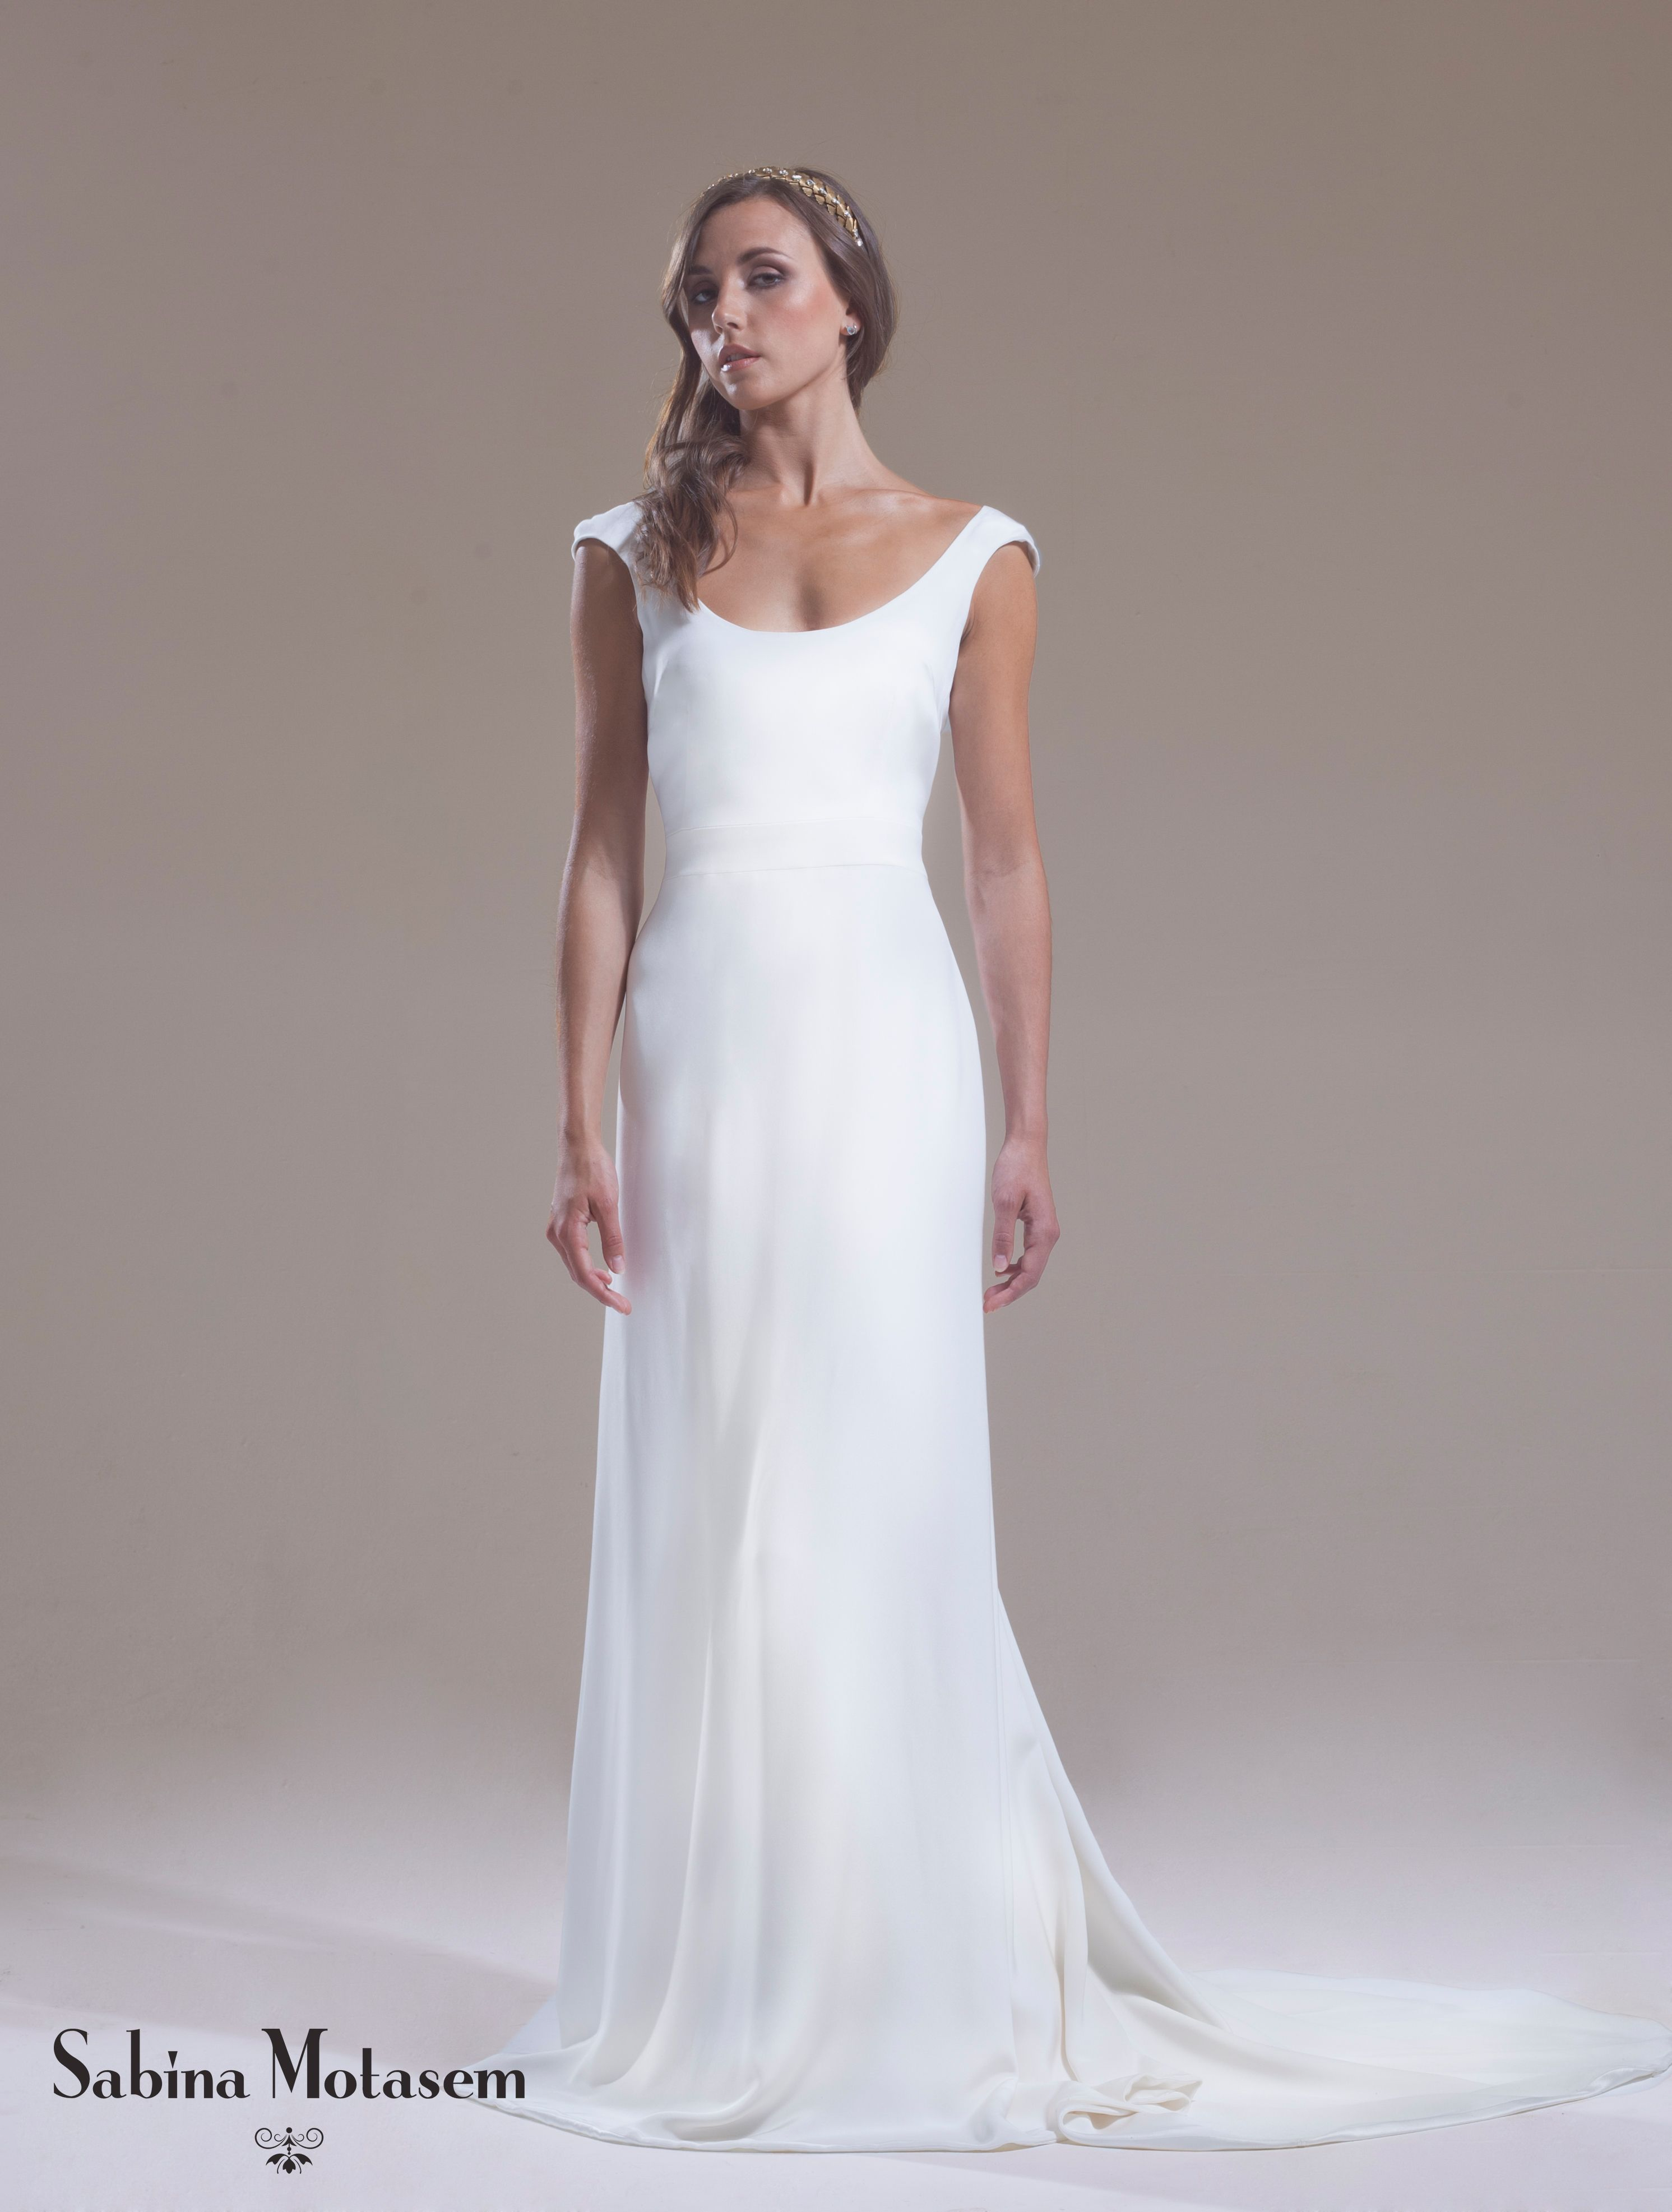 The genevieve dress sabina motasem a bias cut backless slinky the genevieve dress sabina motasem a bias cut backless slinky wedding dress ombrellifo Gallery